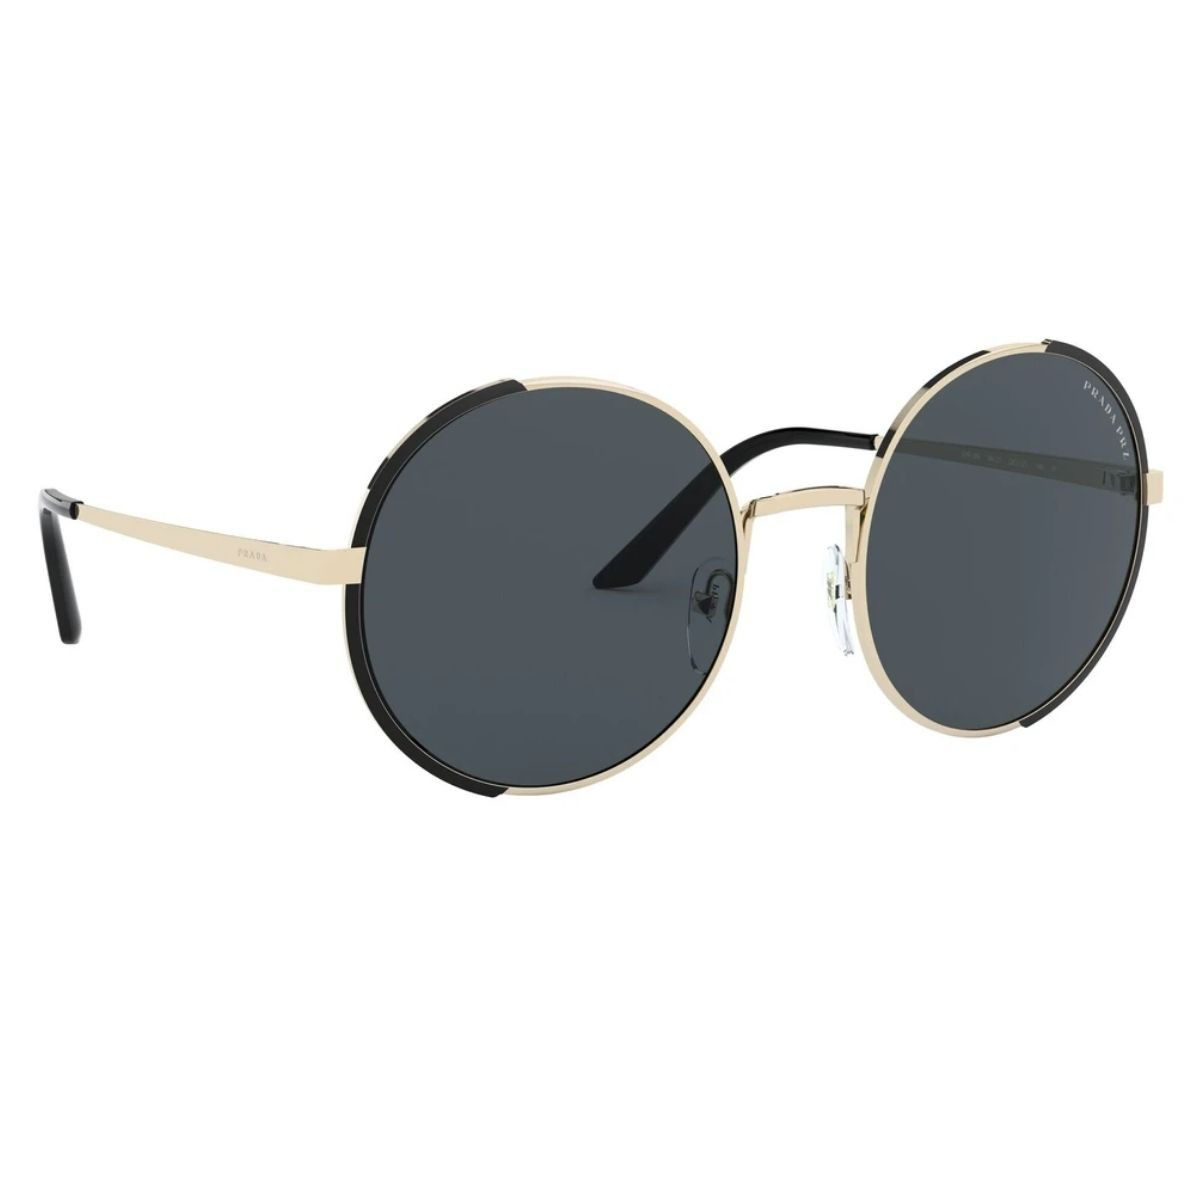 Óculos de Sol Feminino Prada SPR 59X